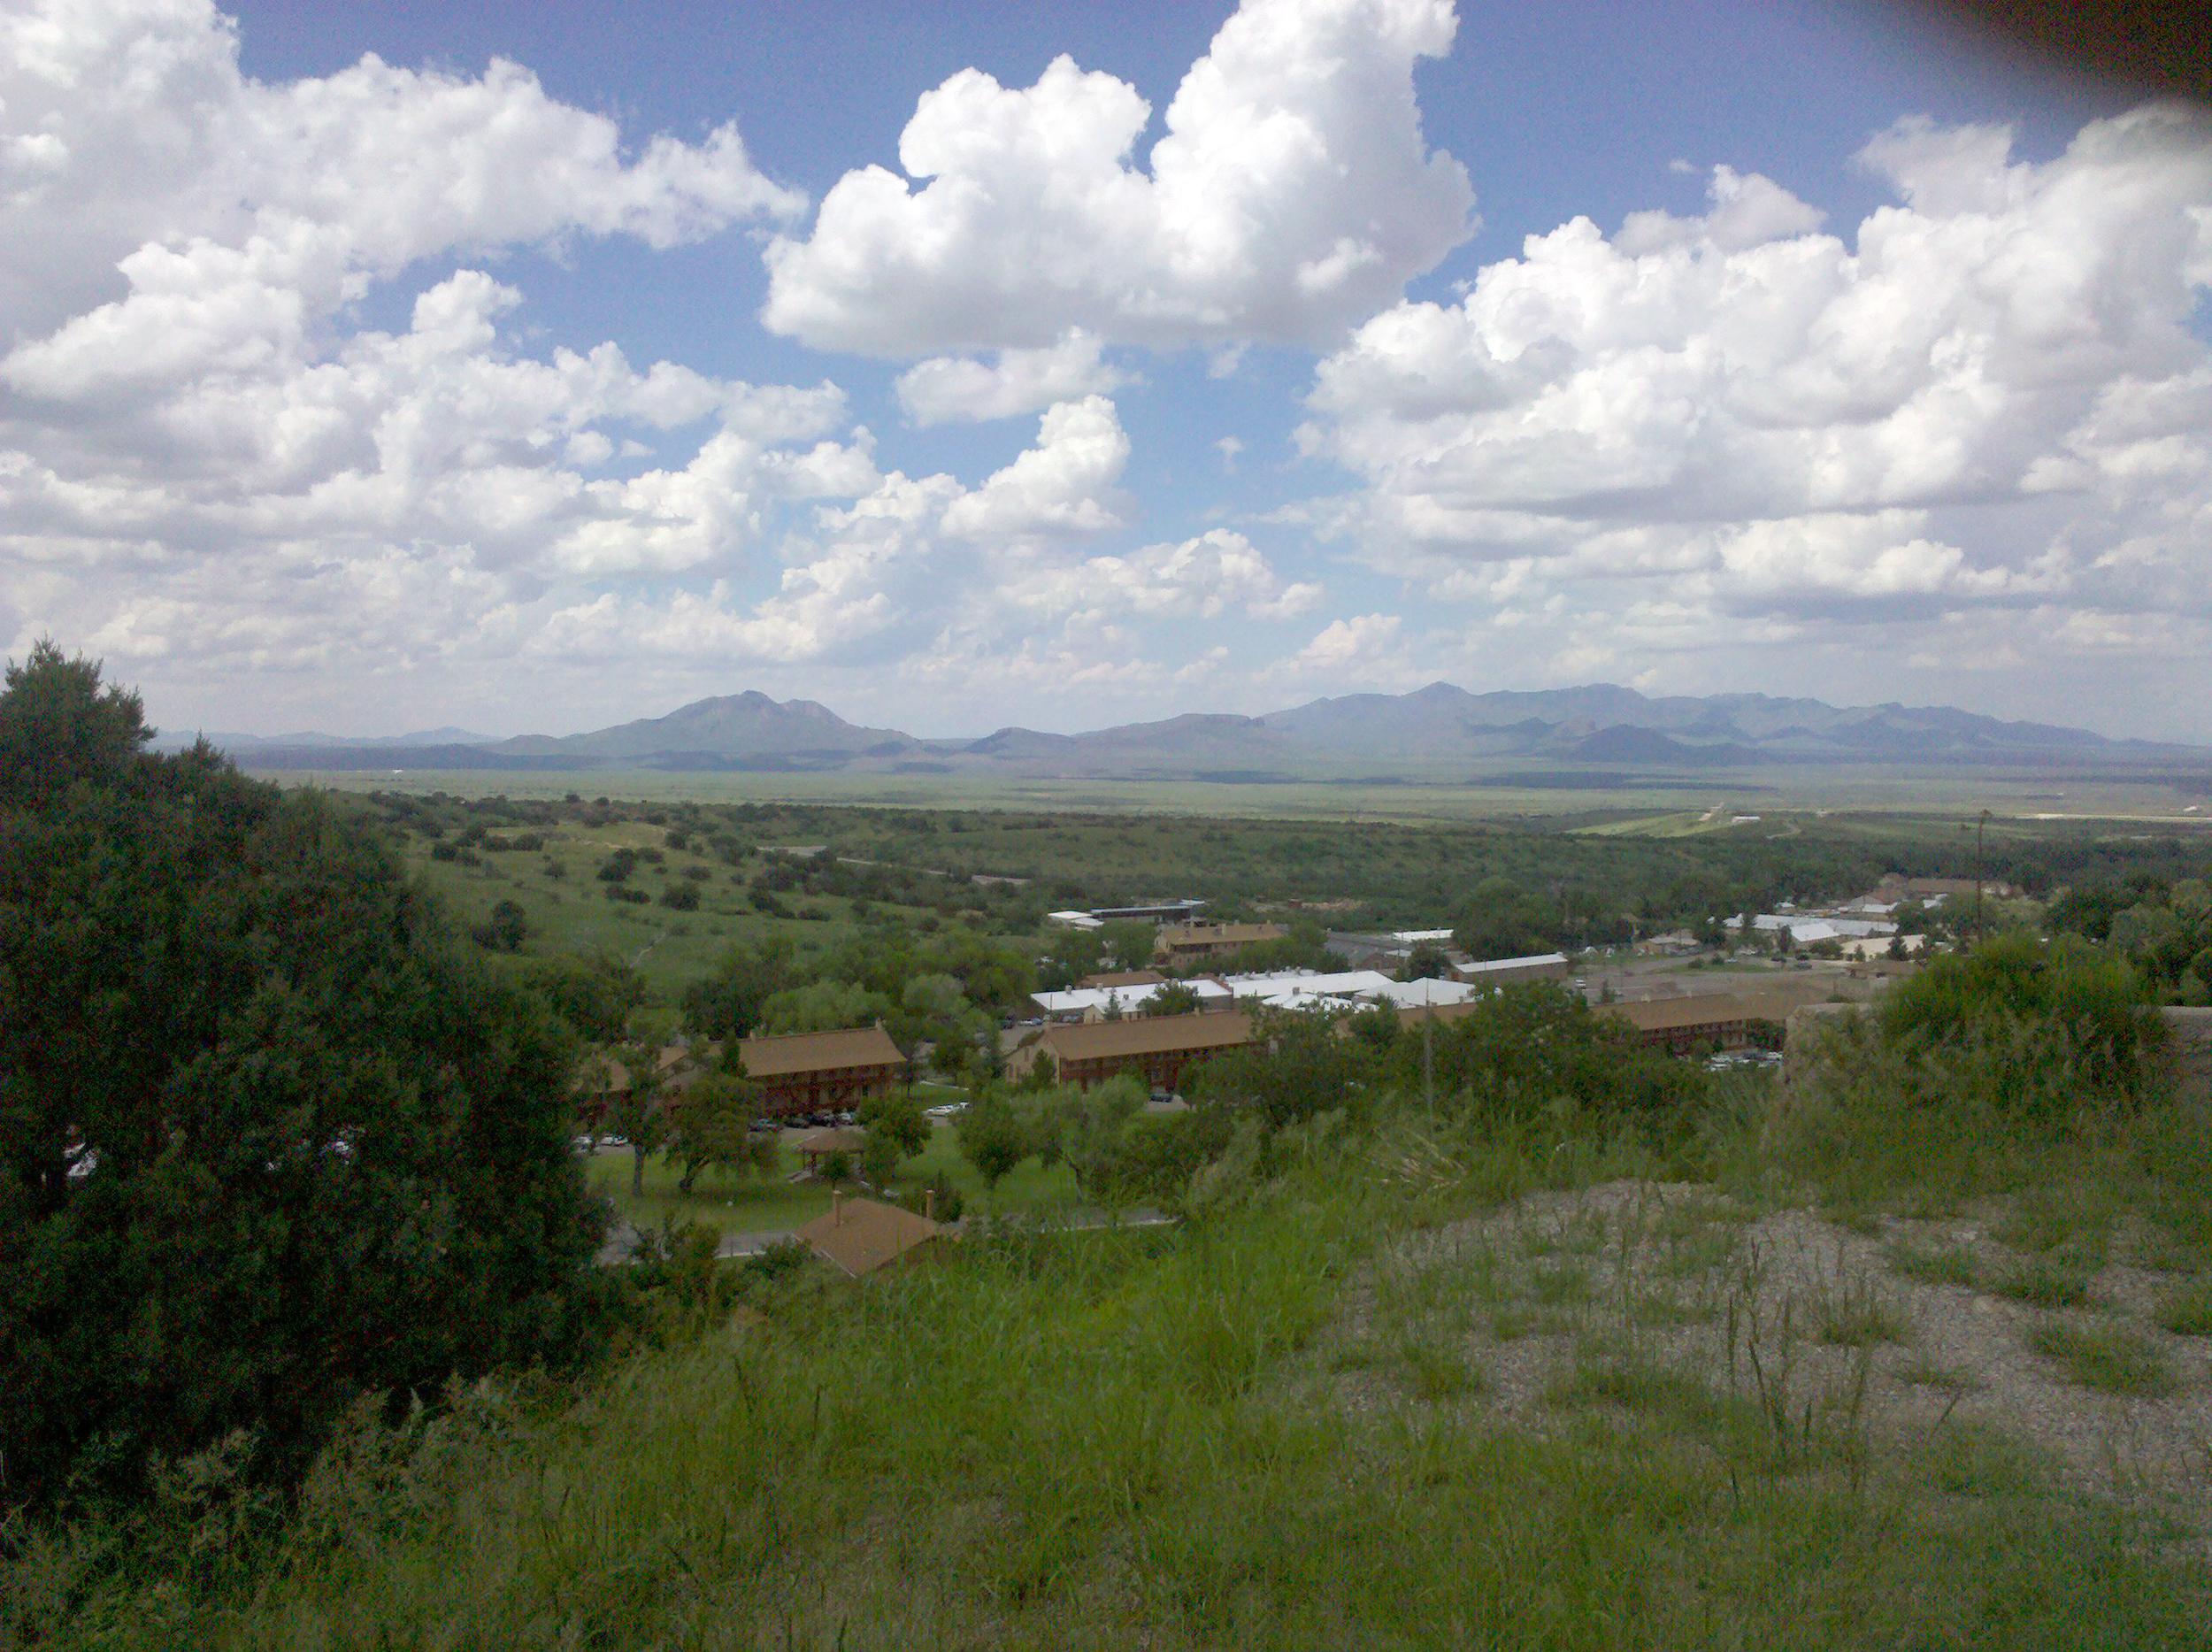 Overlooking_Fort_Huachuca_-Old_Post-.jpg